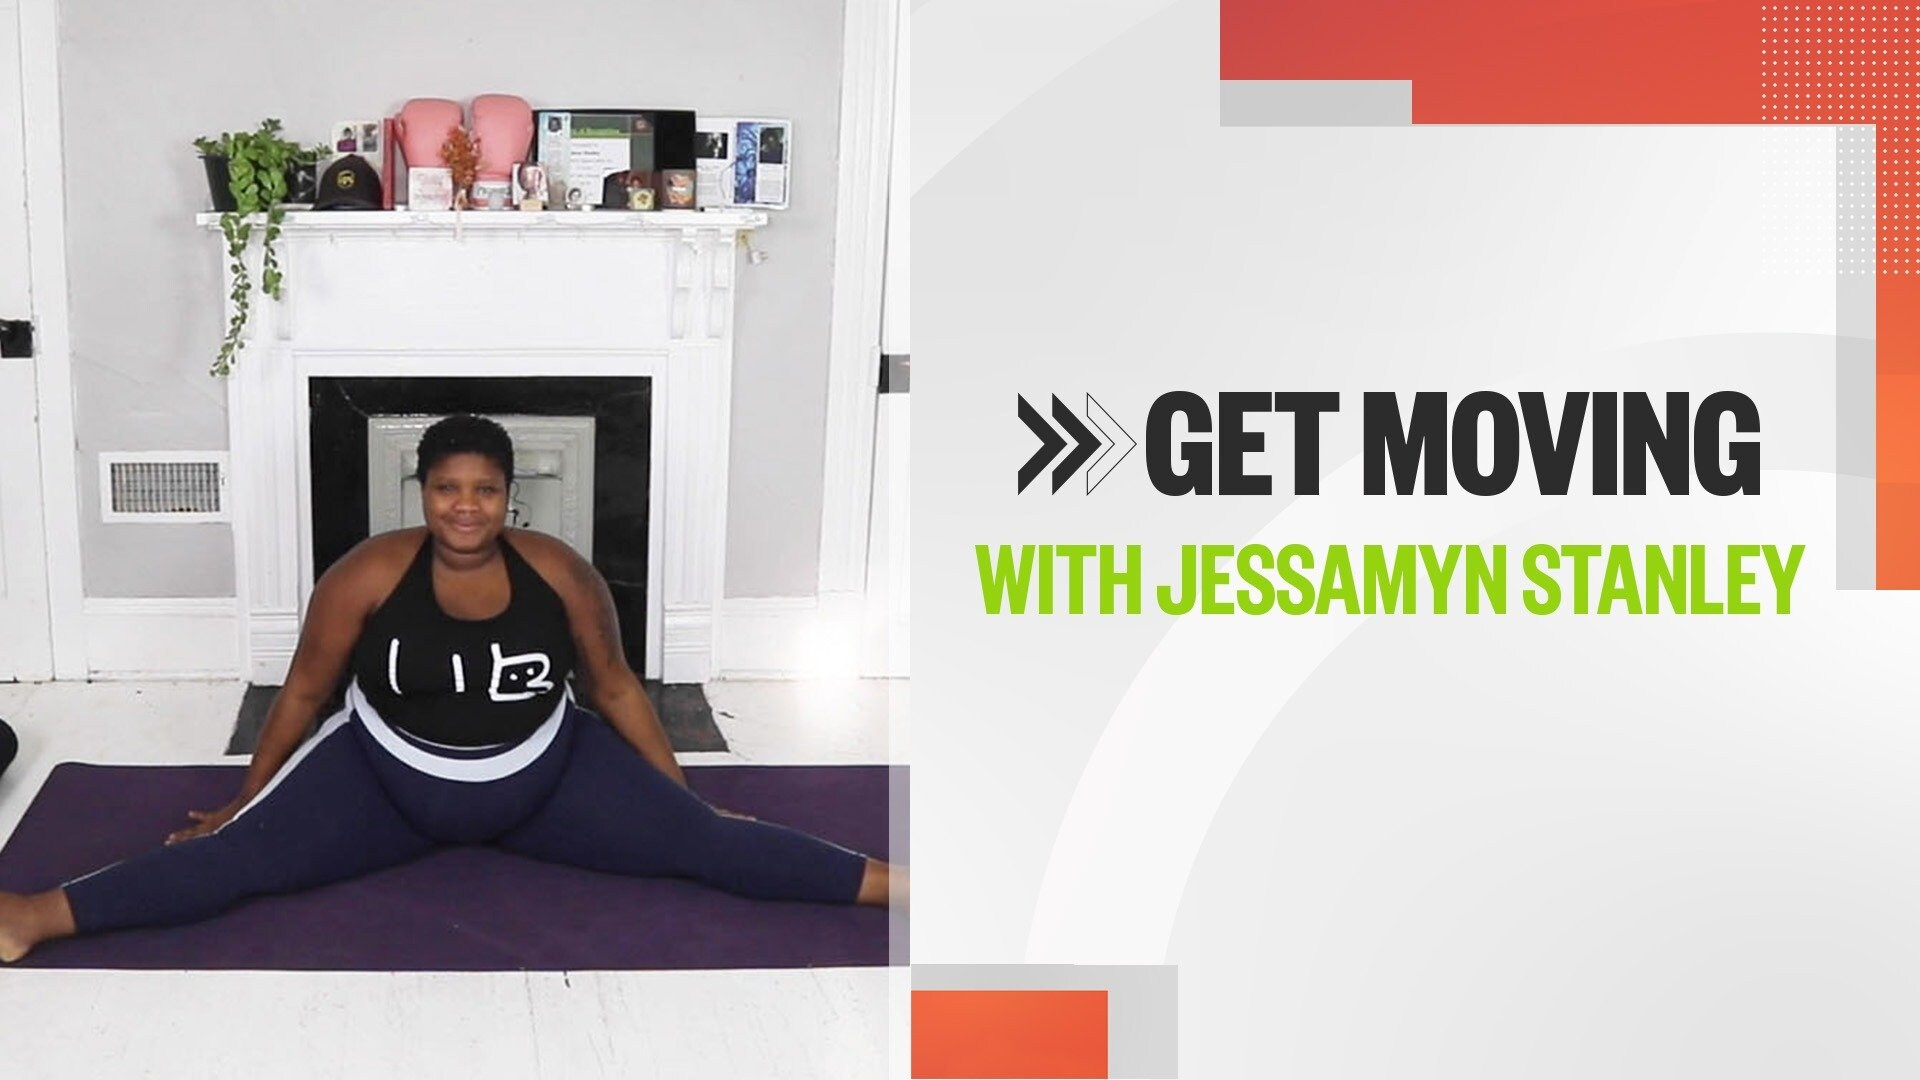 Get Moving With Jessamyn Stanley